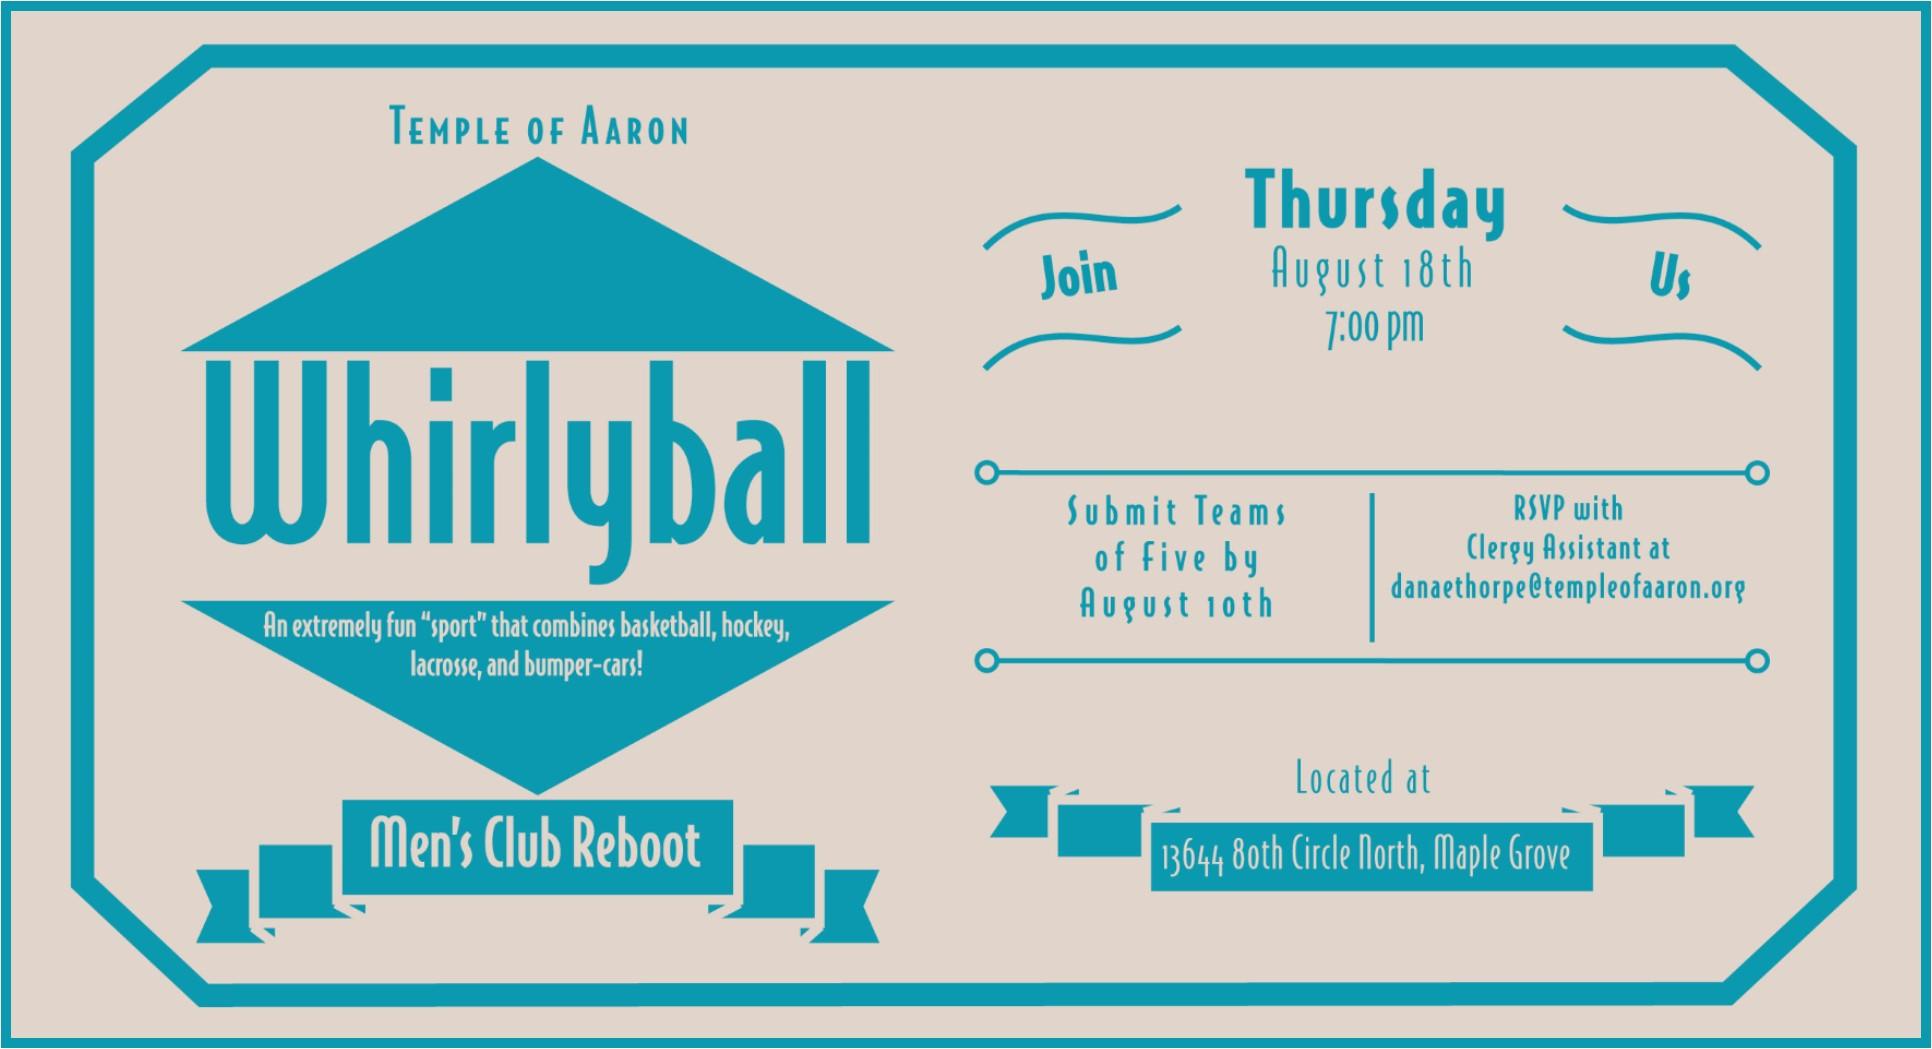 Men's Club Whirlyball Event